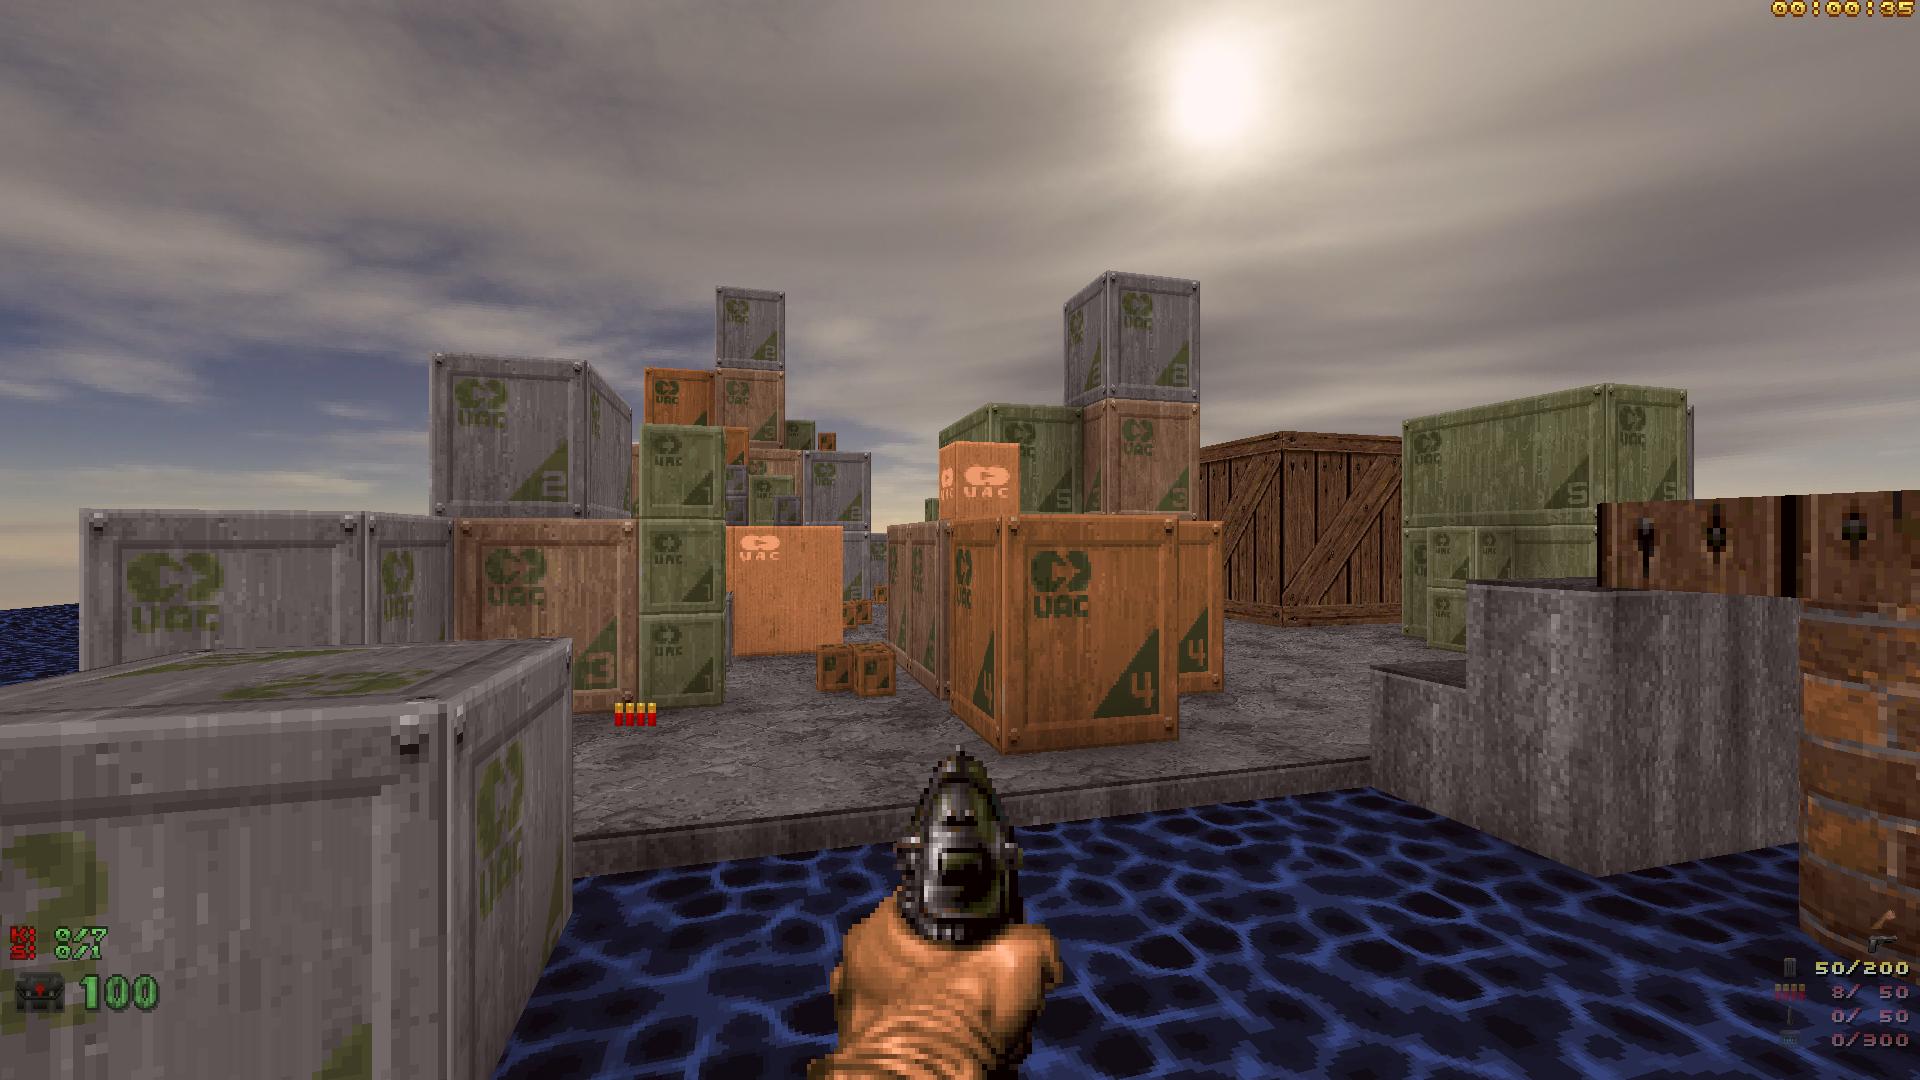 Screenshot_Doom_20210320_130606.png.0a18afe49a90aa20a12247d81199bf42.png